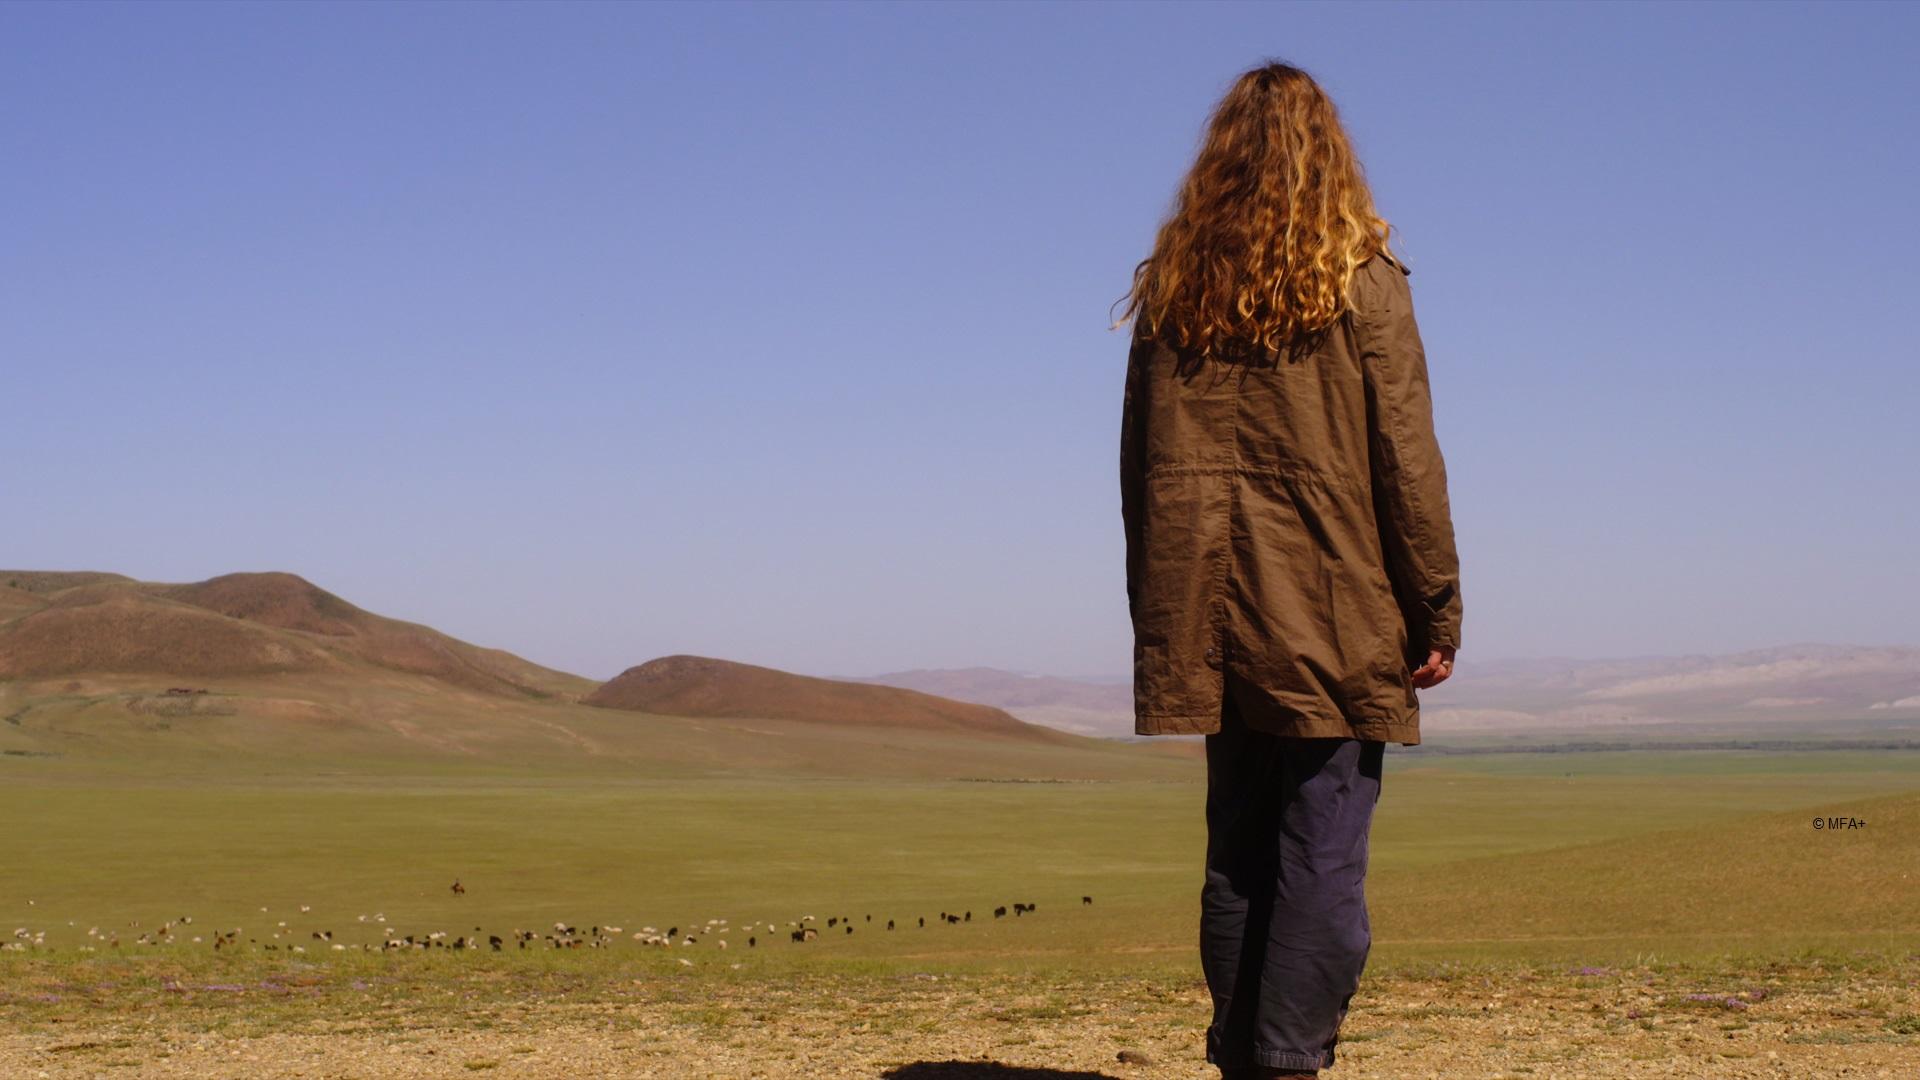 Frau in Mongolischer Steppe, Copyright: MFA